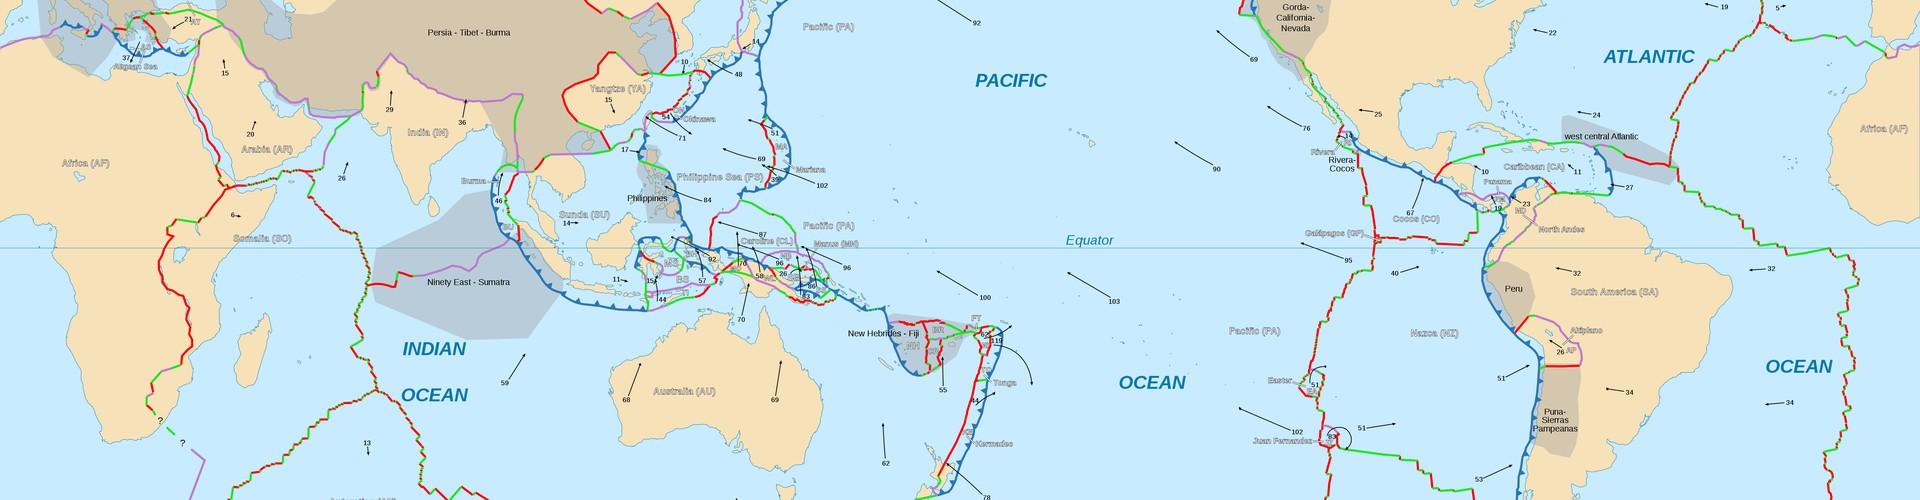 Tectonic plate boundaries (Credit: NGDC World Coast Line data/P. Bird/E. Gaba)